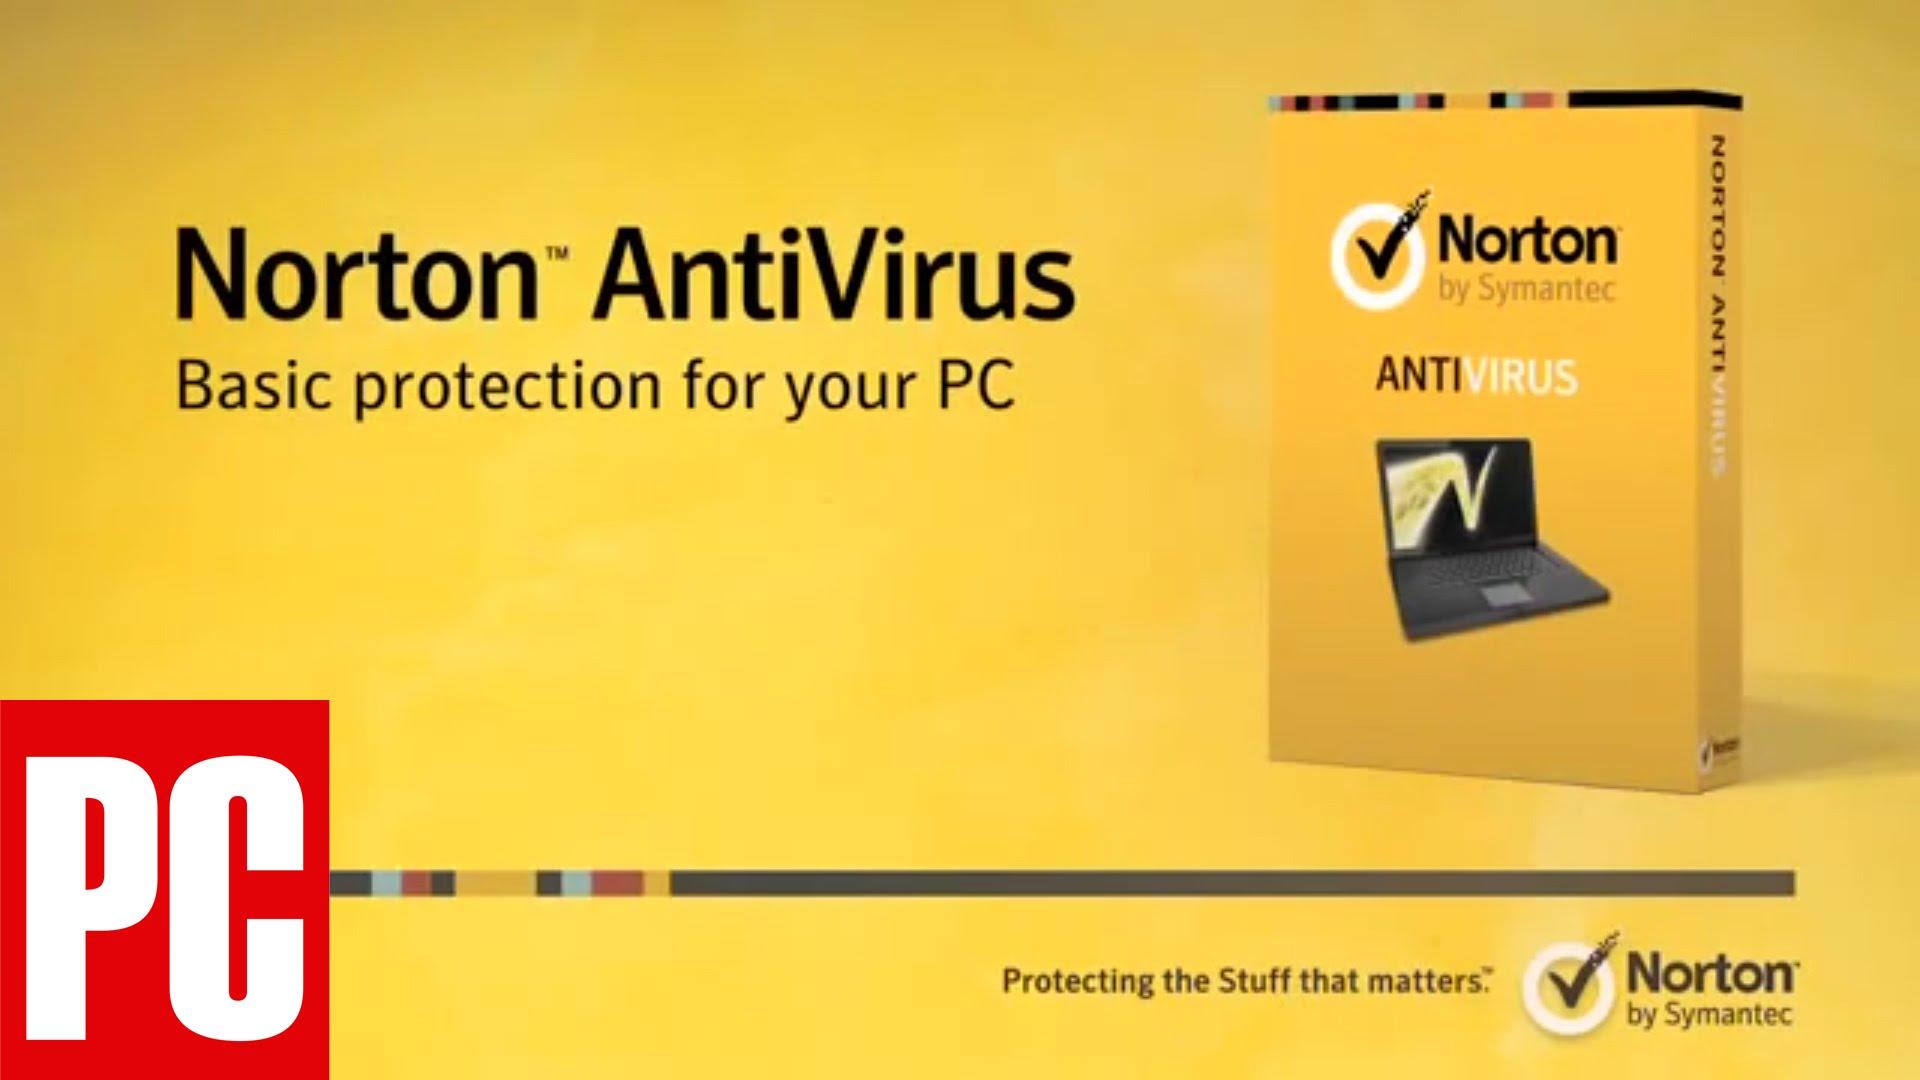 Antivirus and Malware Protection | Antivirus for PC, Mac®, Android™ & iOS